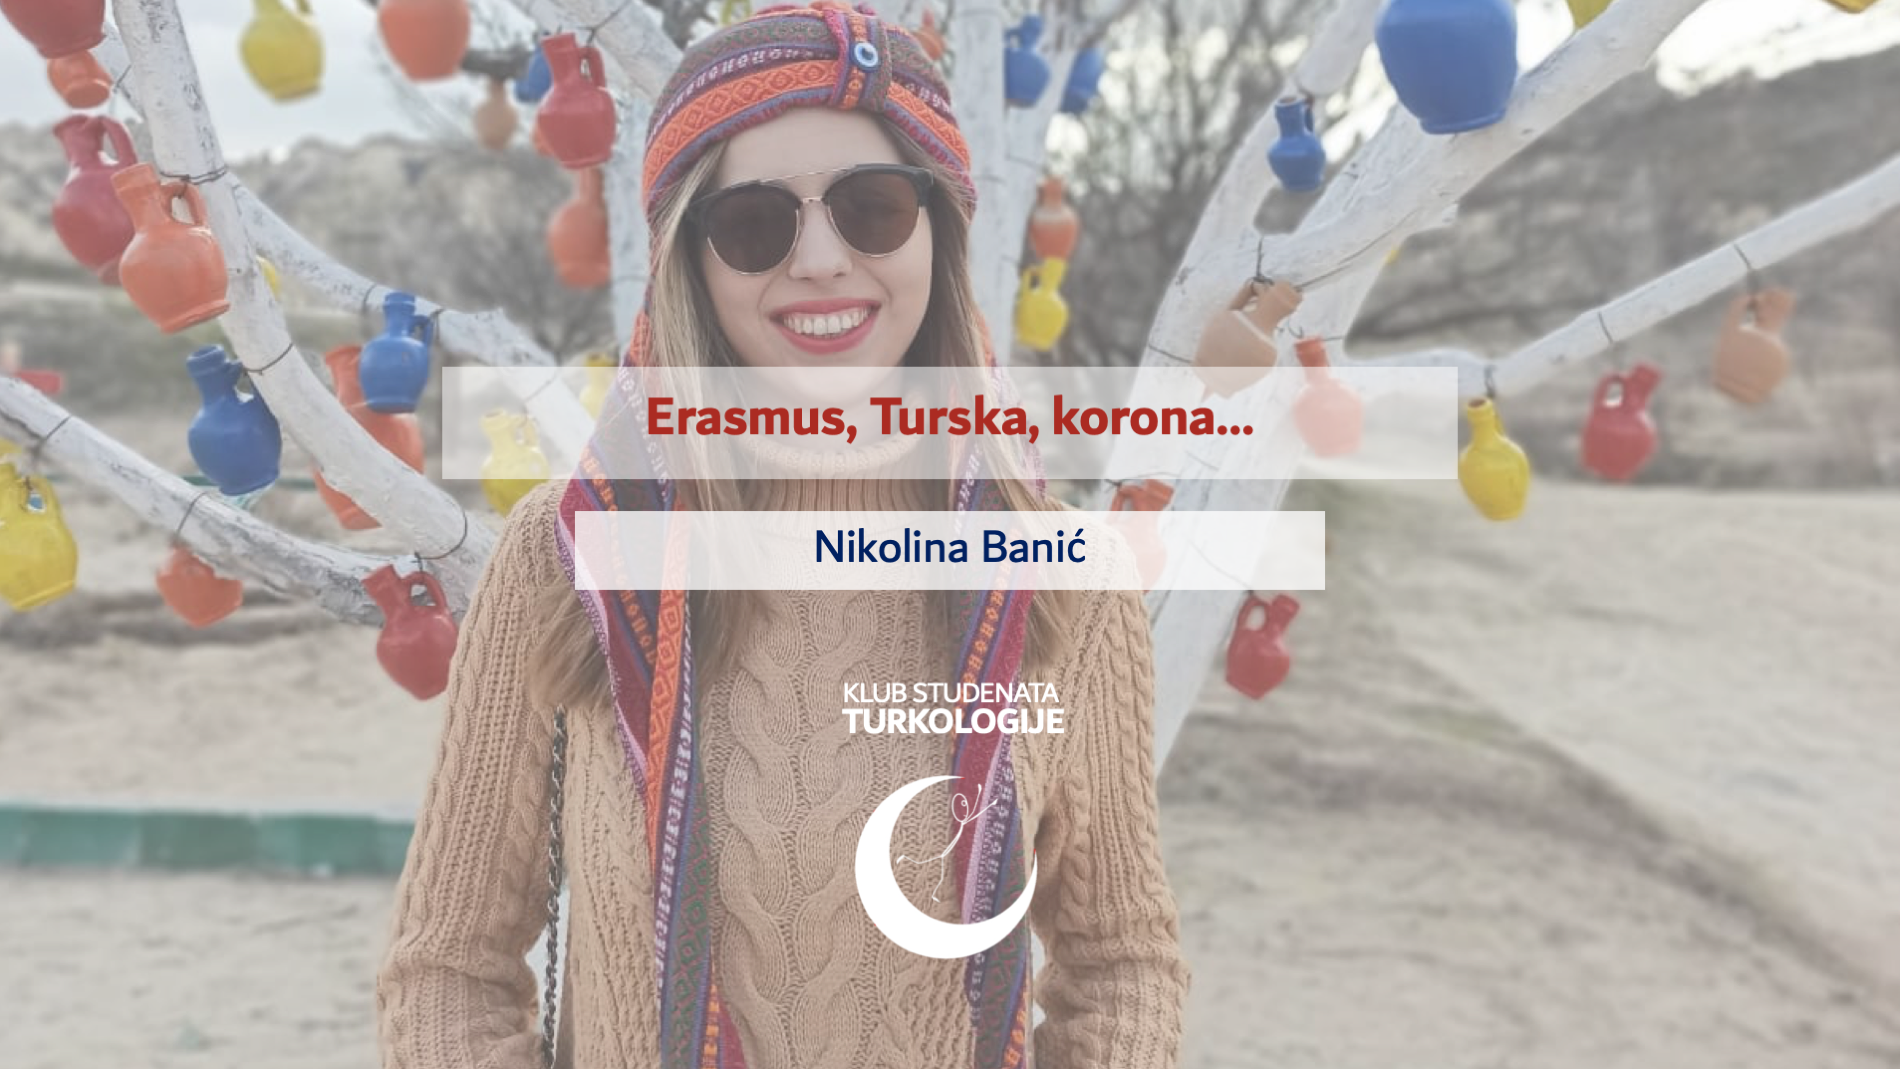 Erasmus, Turska, korona…